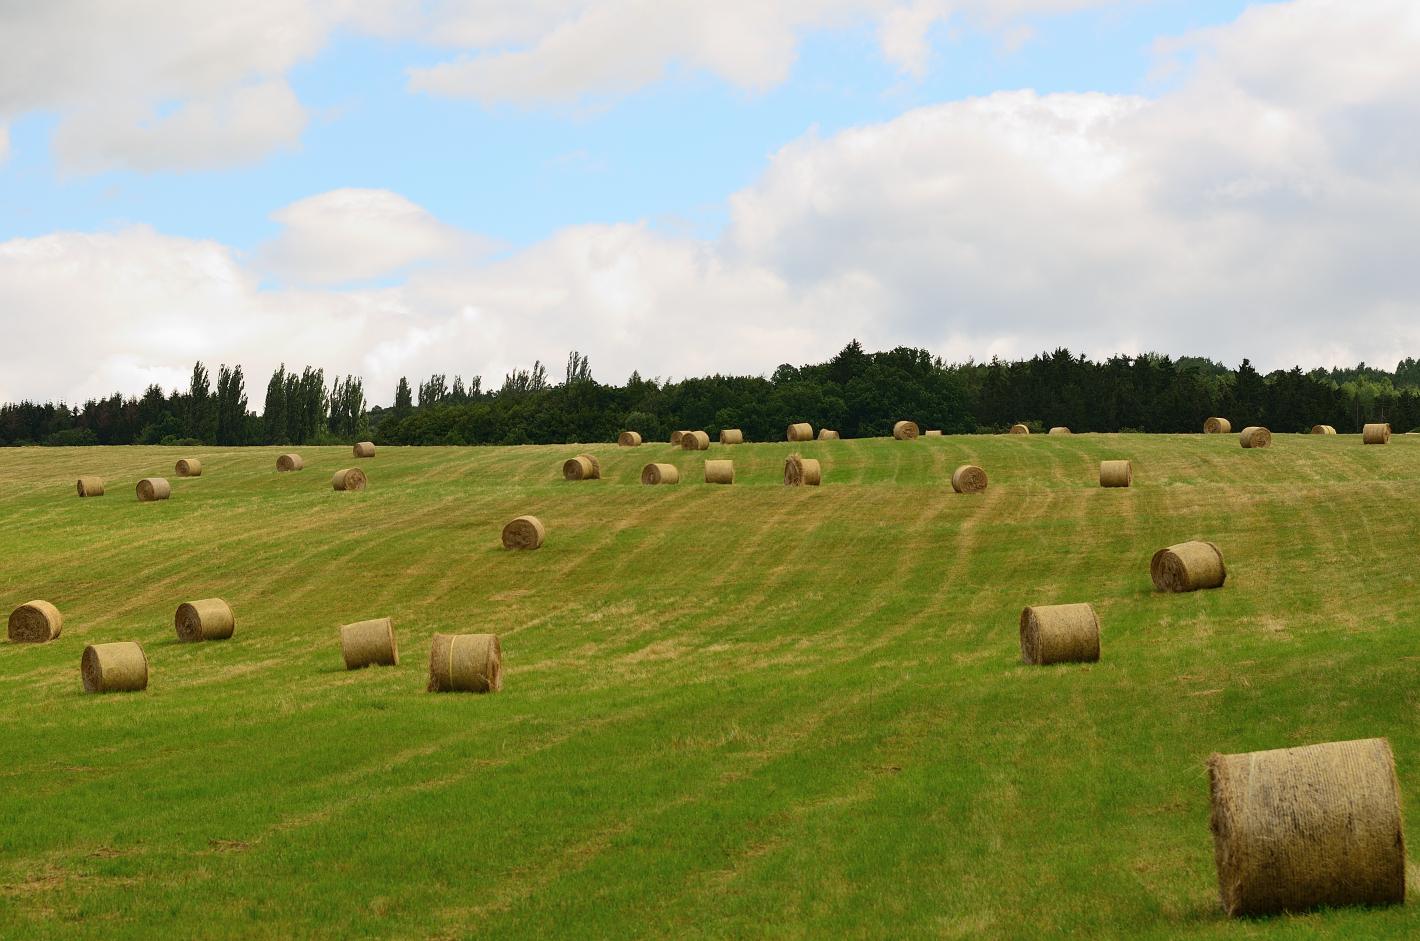 Erntezeit,  harvest time, tiempo de cosecha